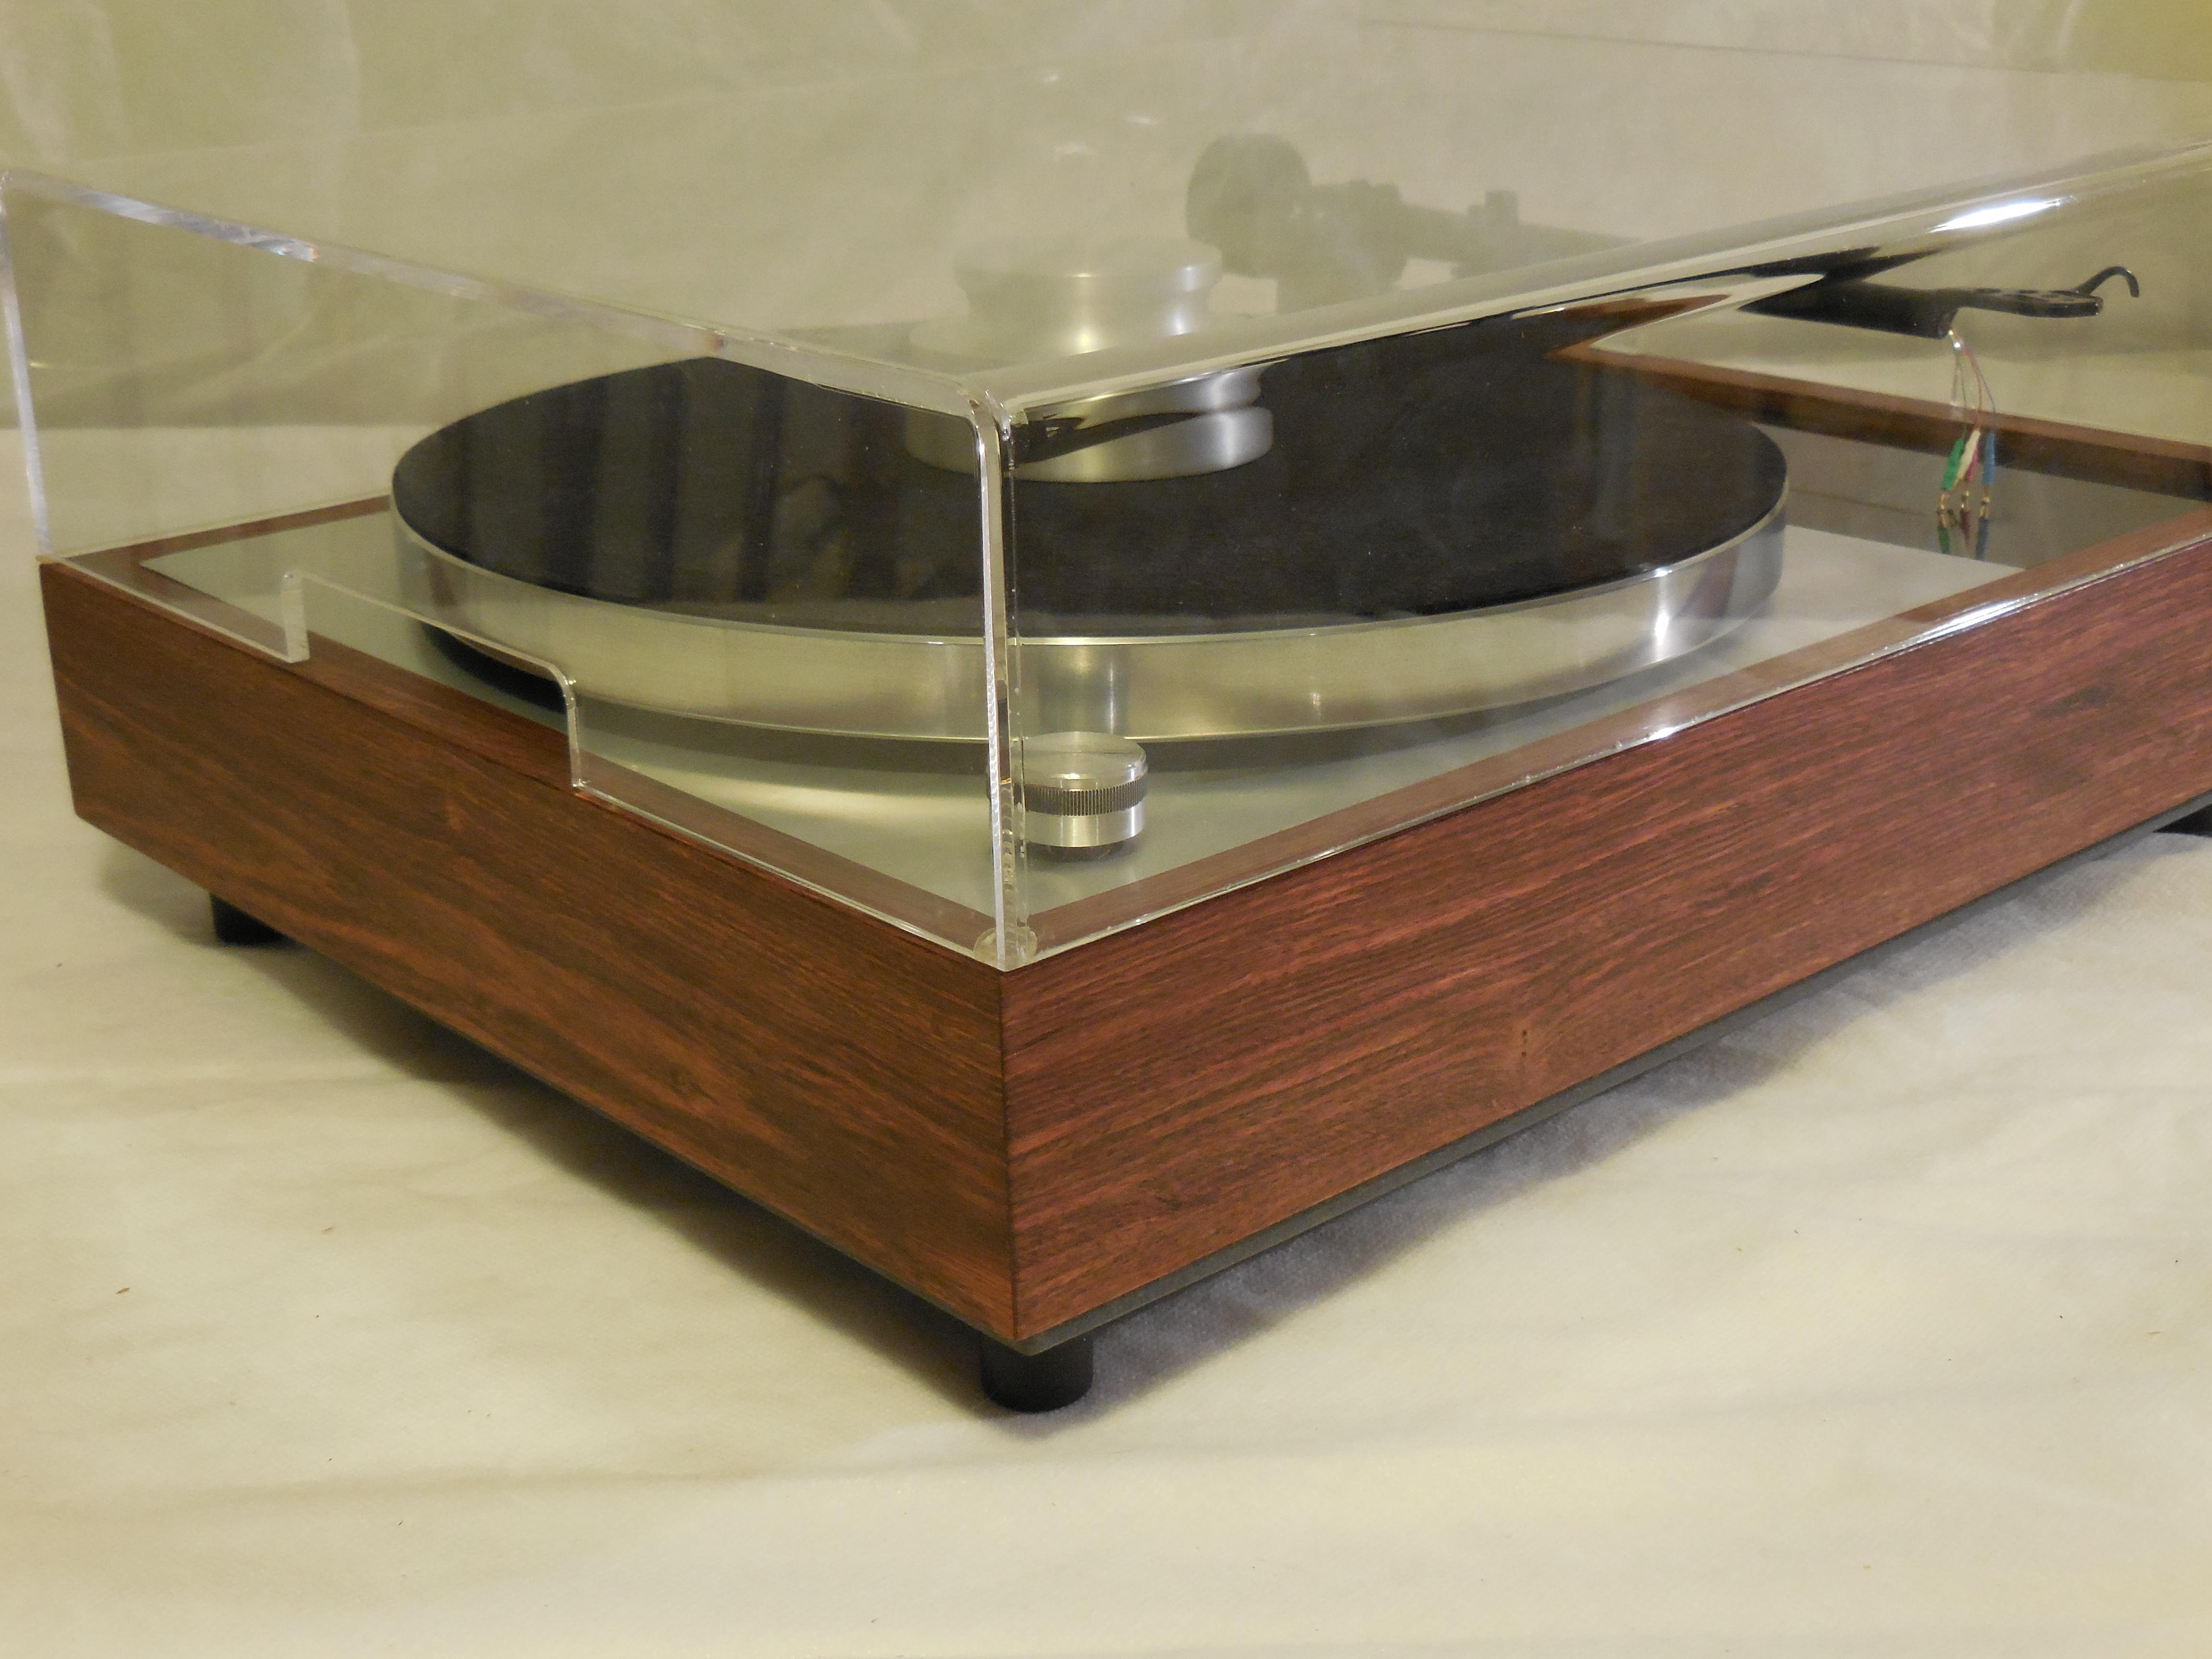 vinyl nirvana 39 s vn 150 a transformed thorens td 150 in custom caribbean rosewood plinth. Black Bedroom Furniture Sets. Home Design Ideas